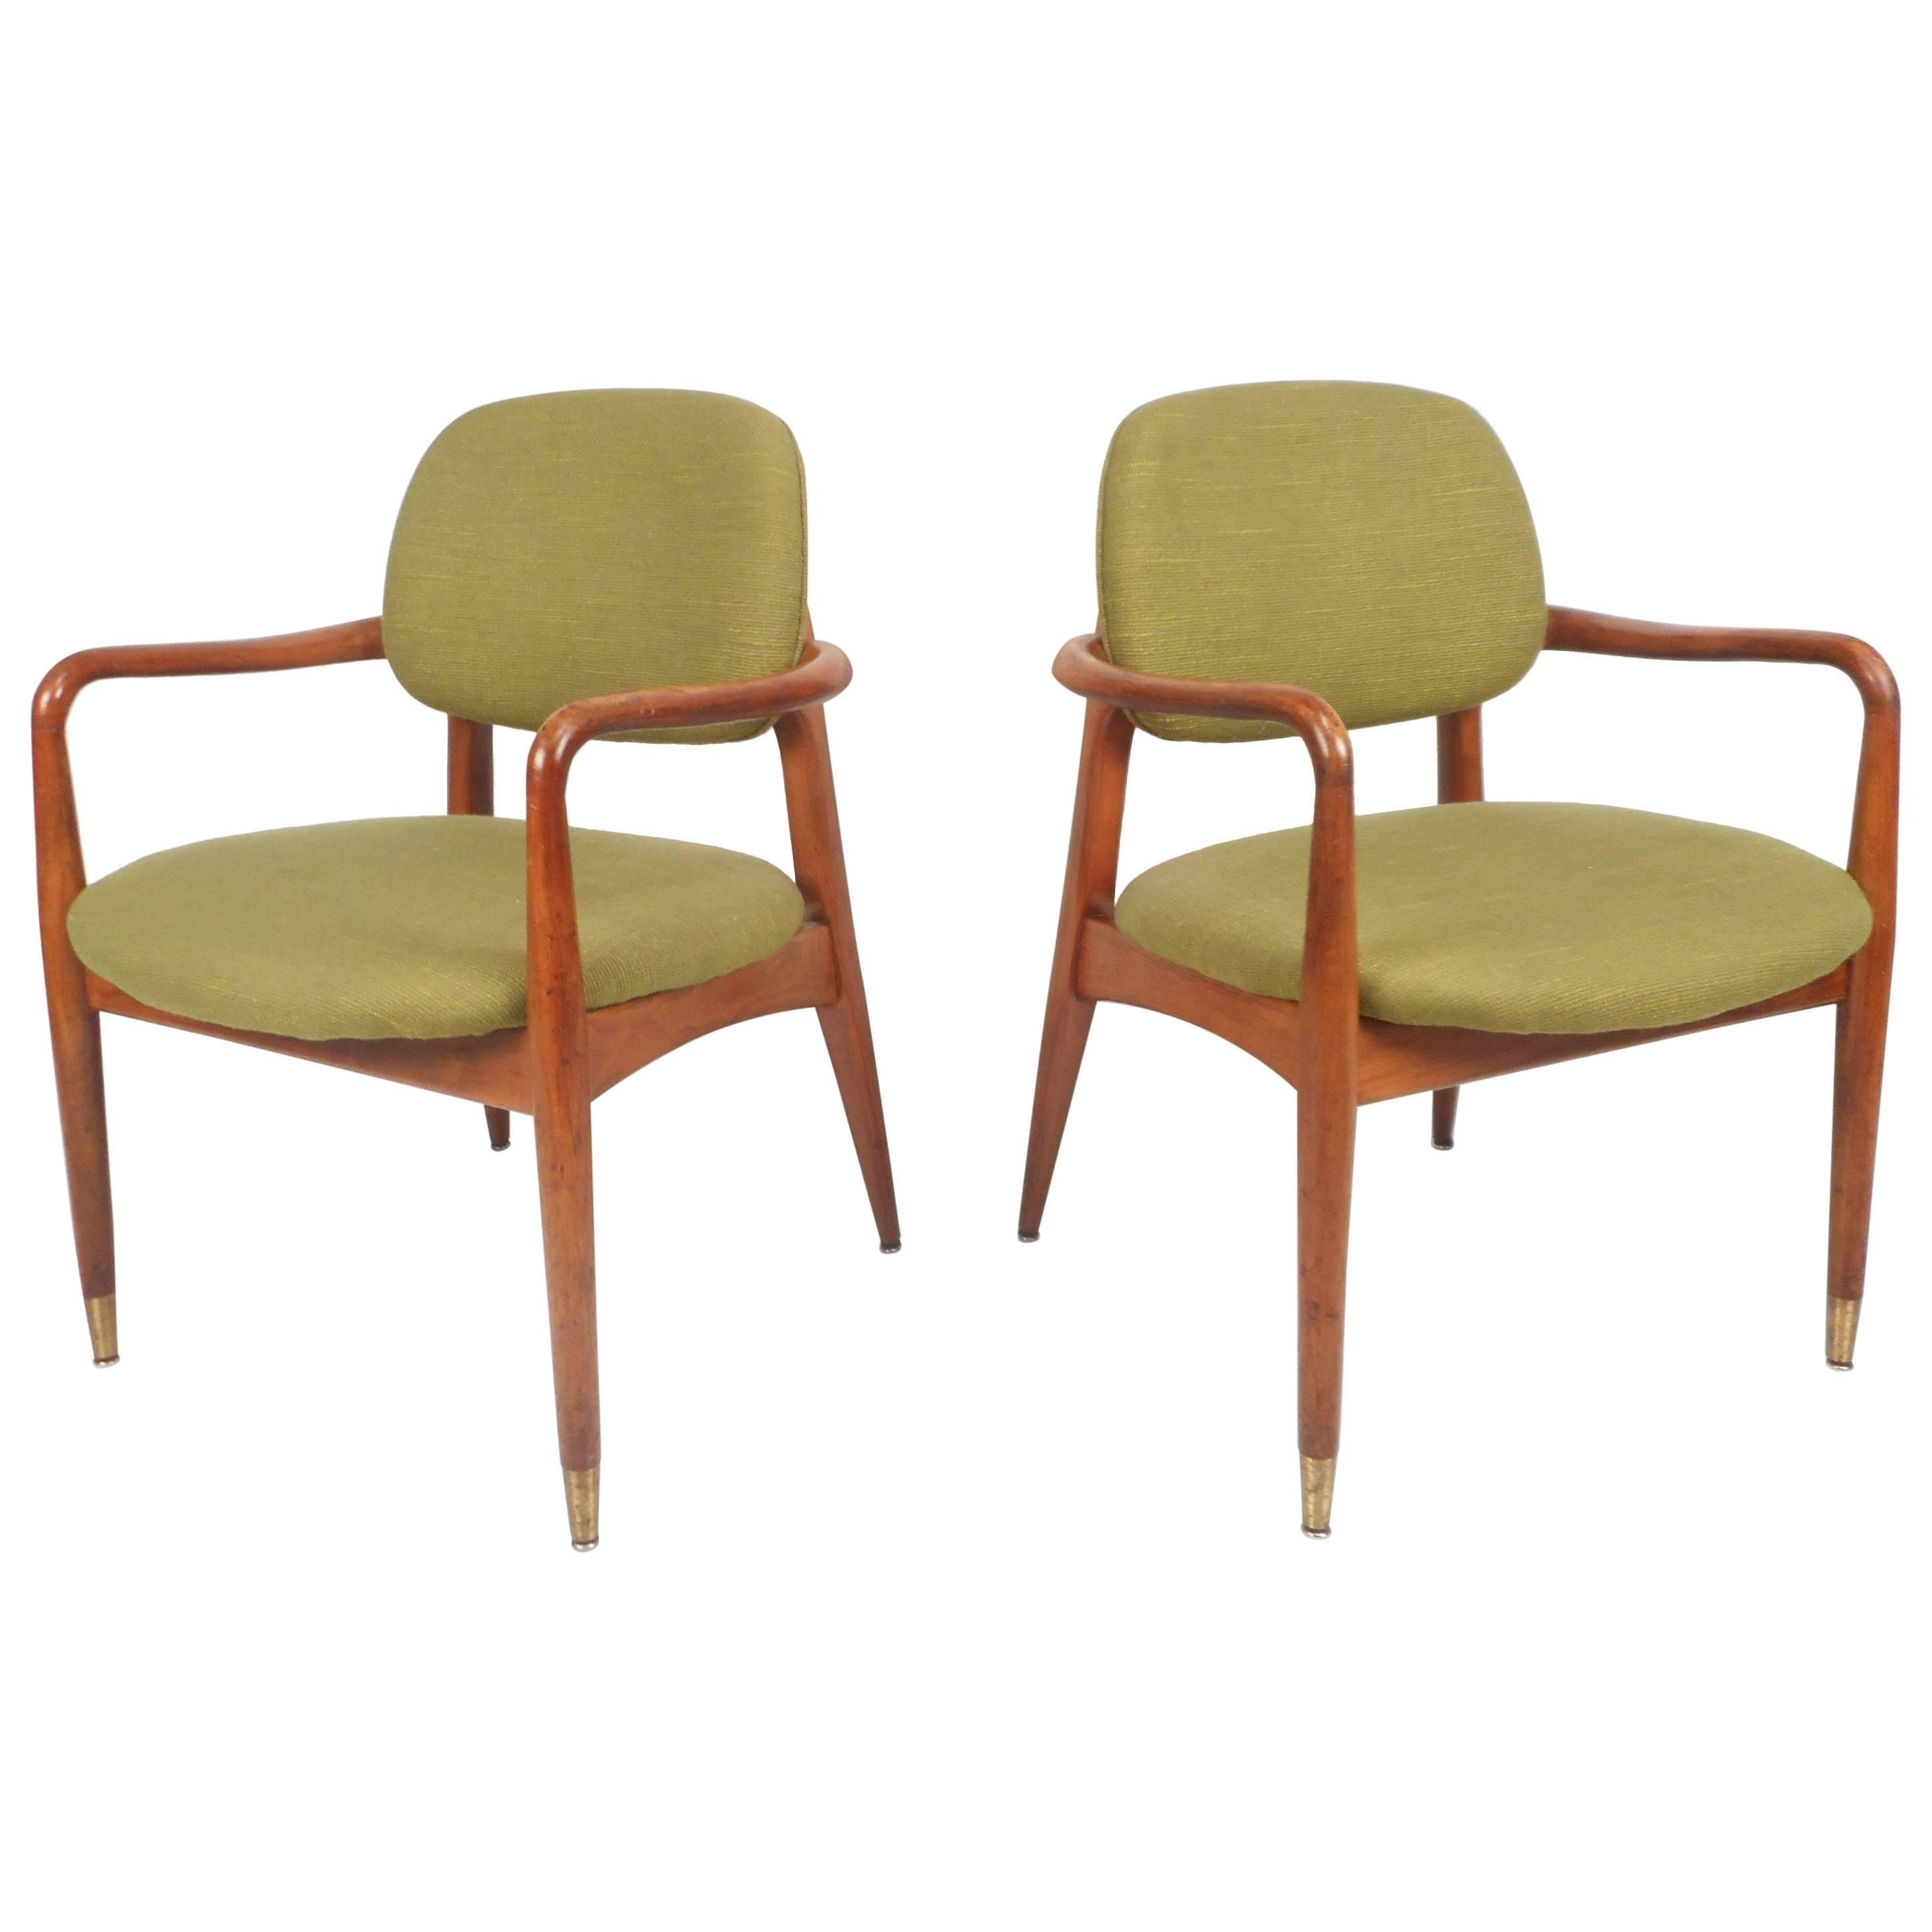 Unique Pair of Danish Mid-Century Modern Armchairs